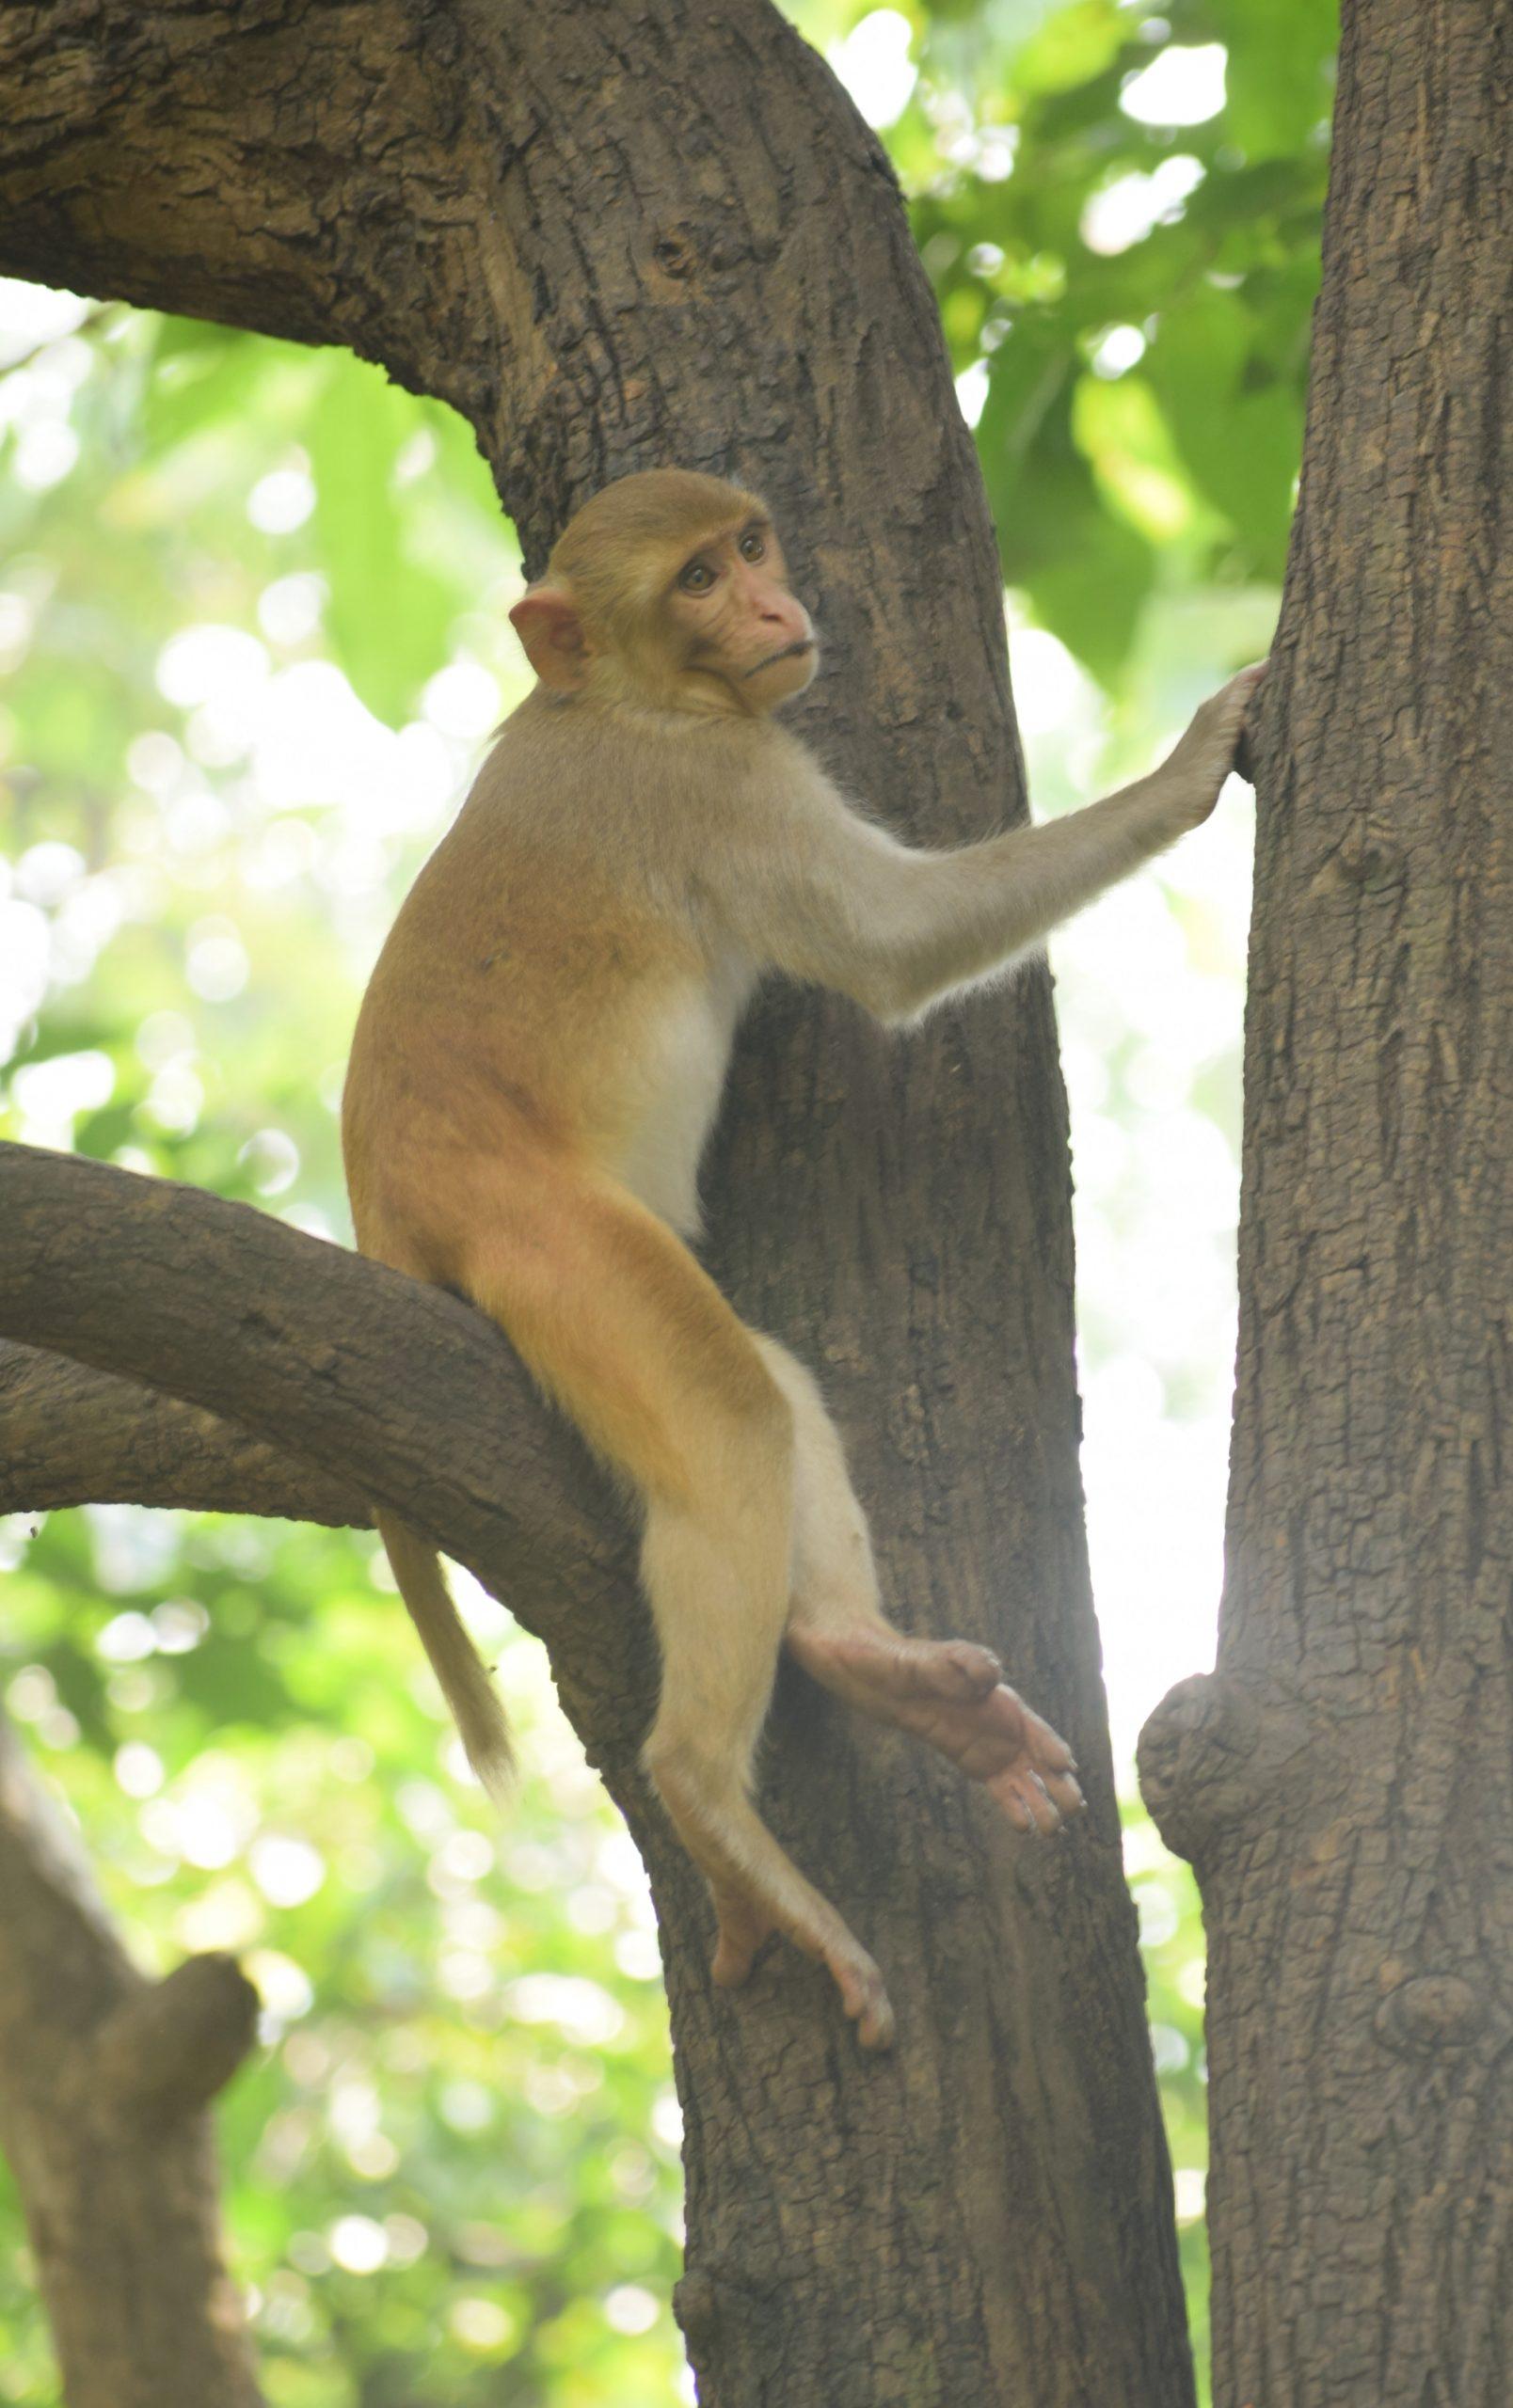 Monkey sitting on tree